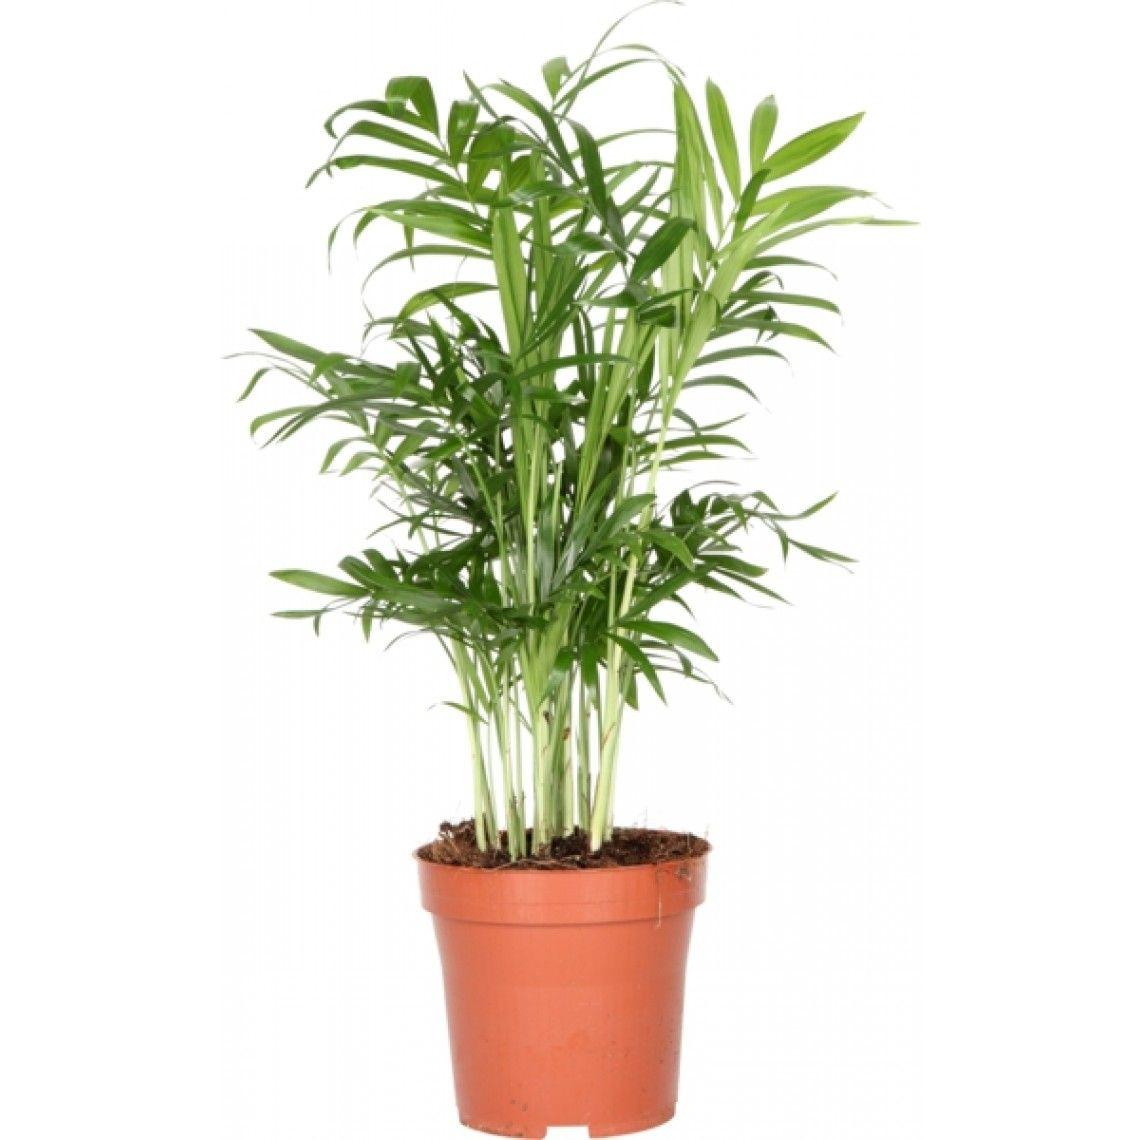 Sirovuoripalmu | Puutarhaunelmia | Pinterest | Planters, Botany and ...